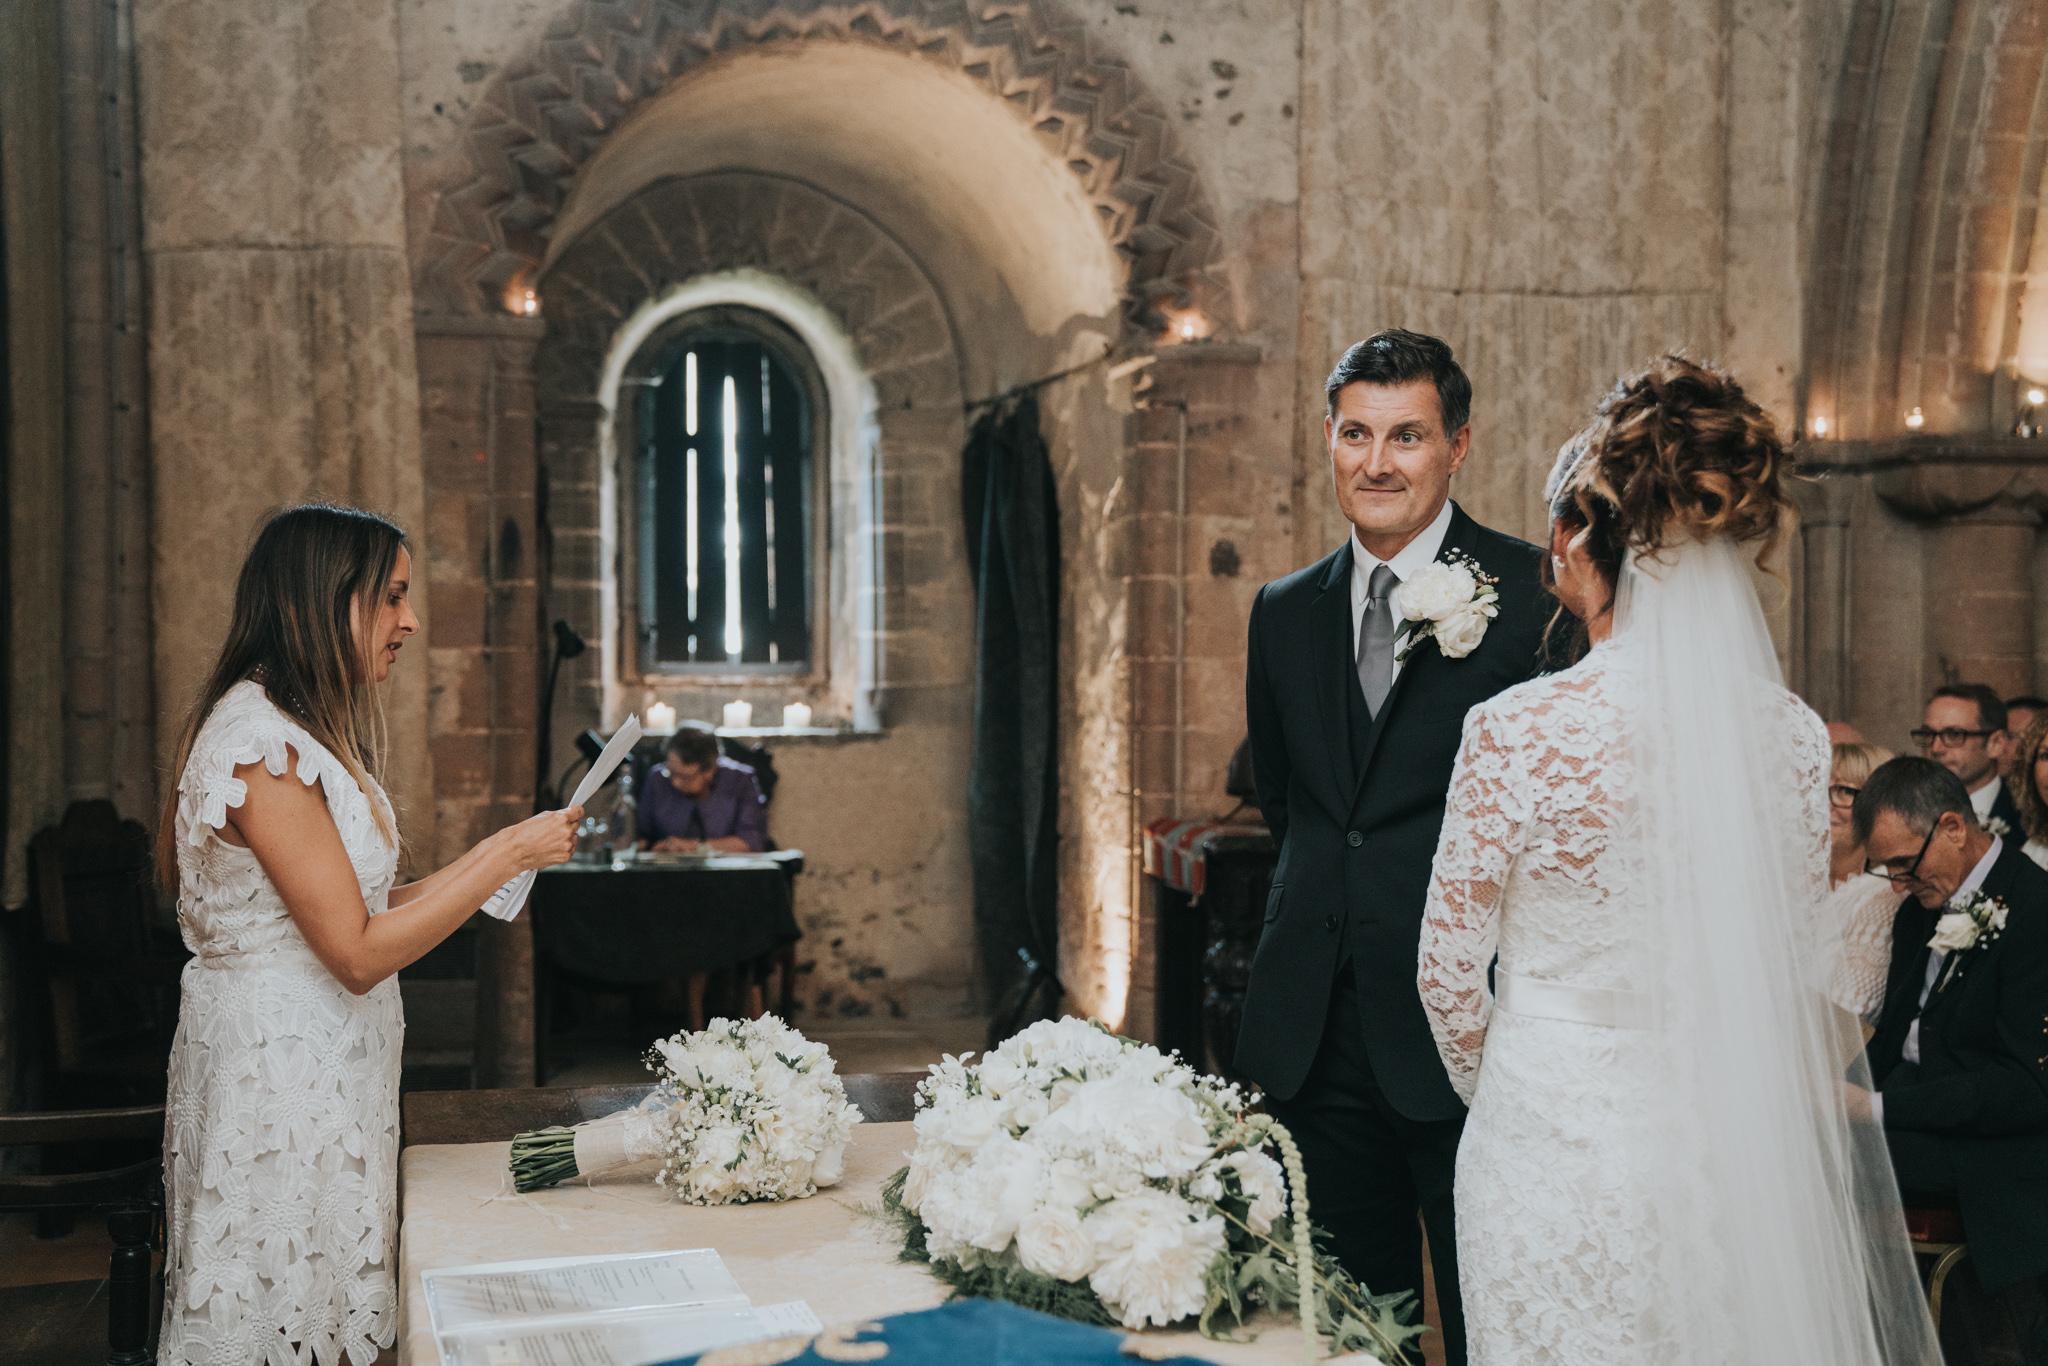 grace-elizabeth-boho-wedding-headingham-castle-essex-wedding-photographer-33.jpg